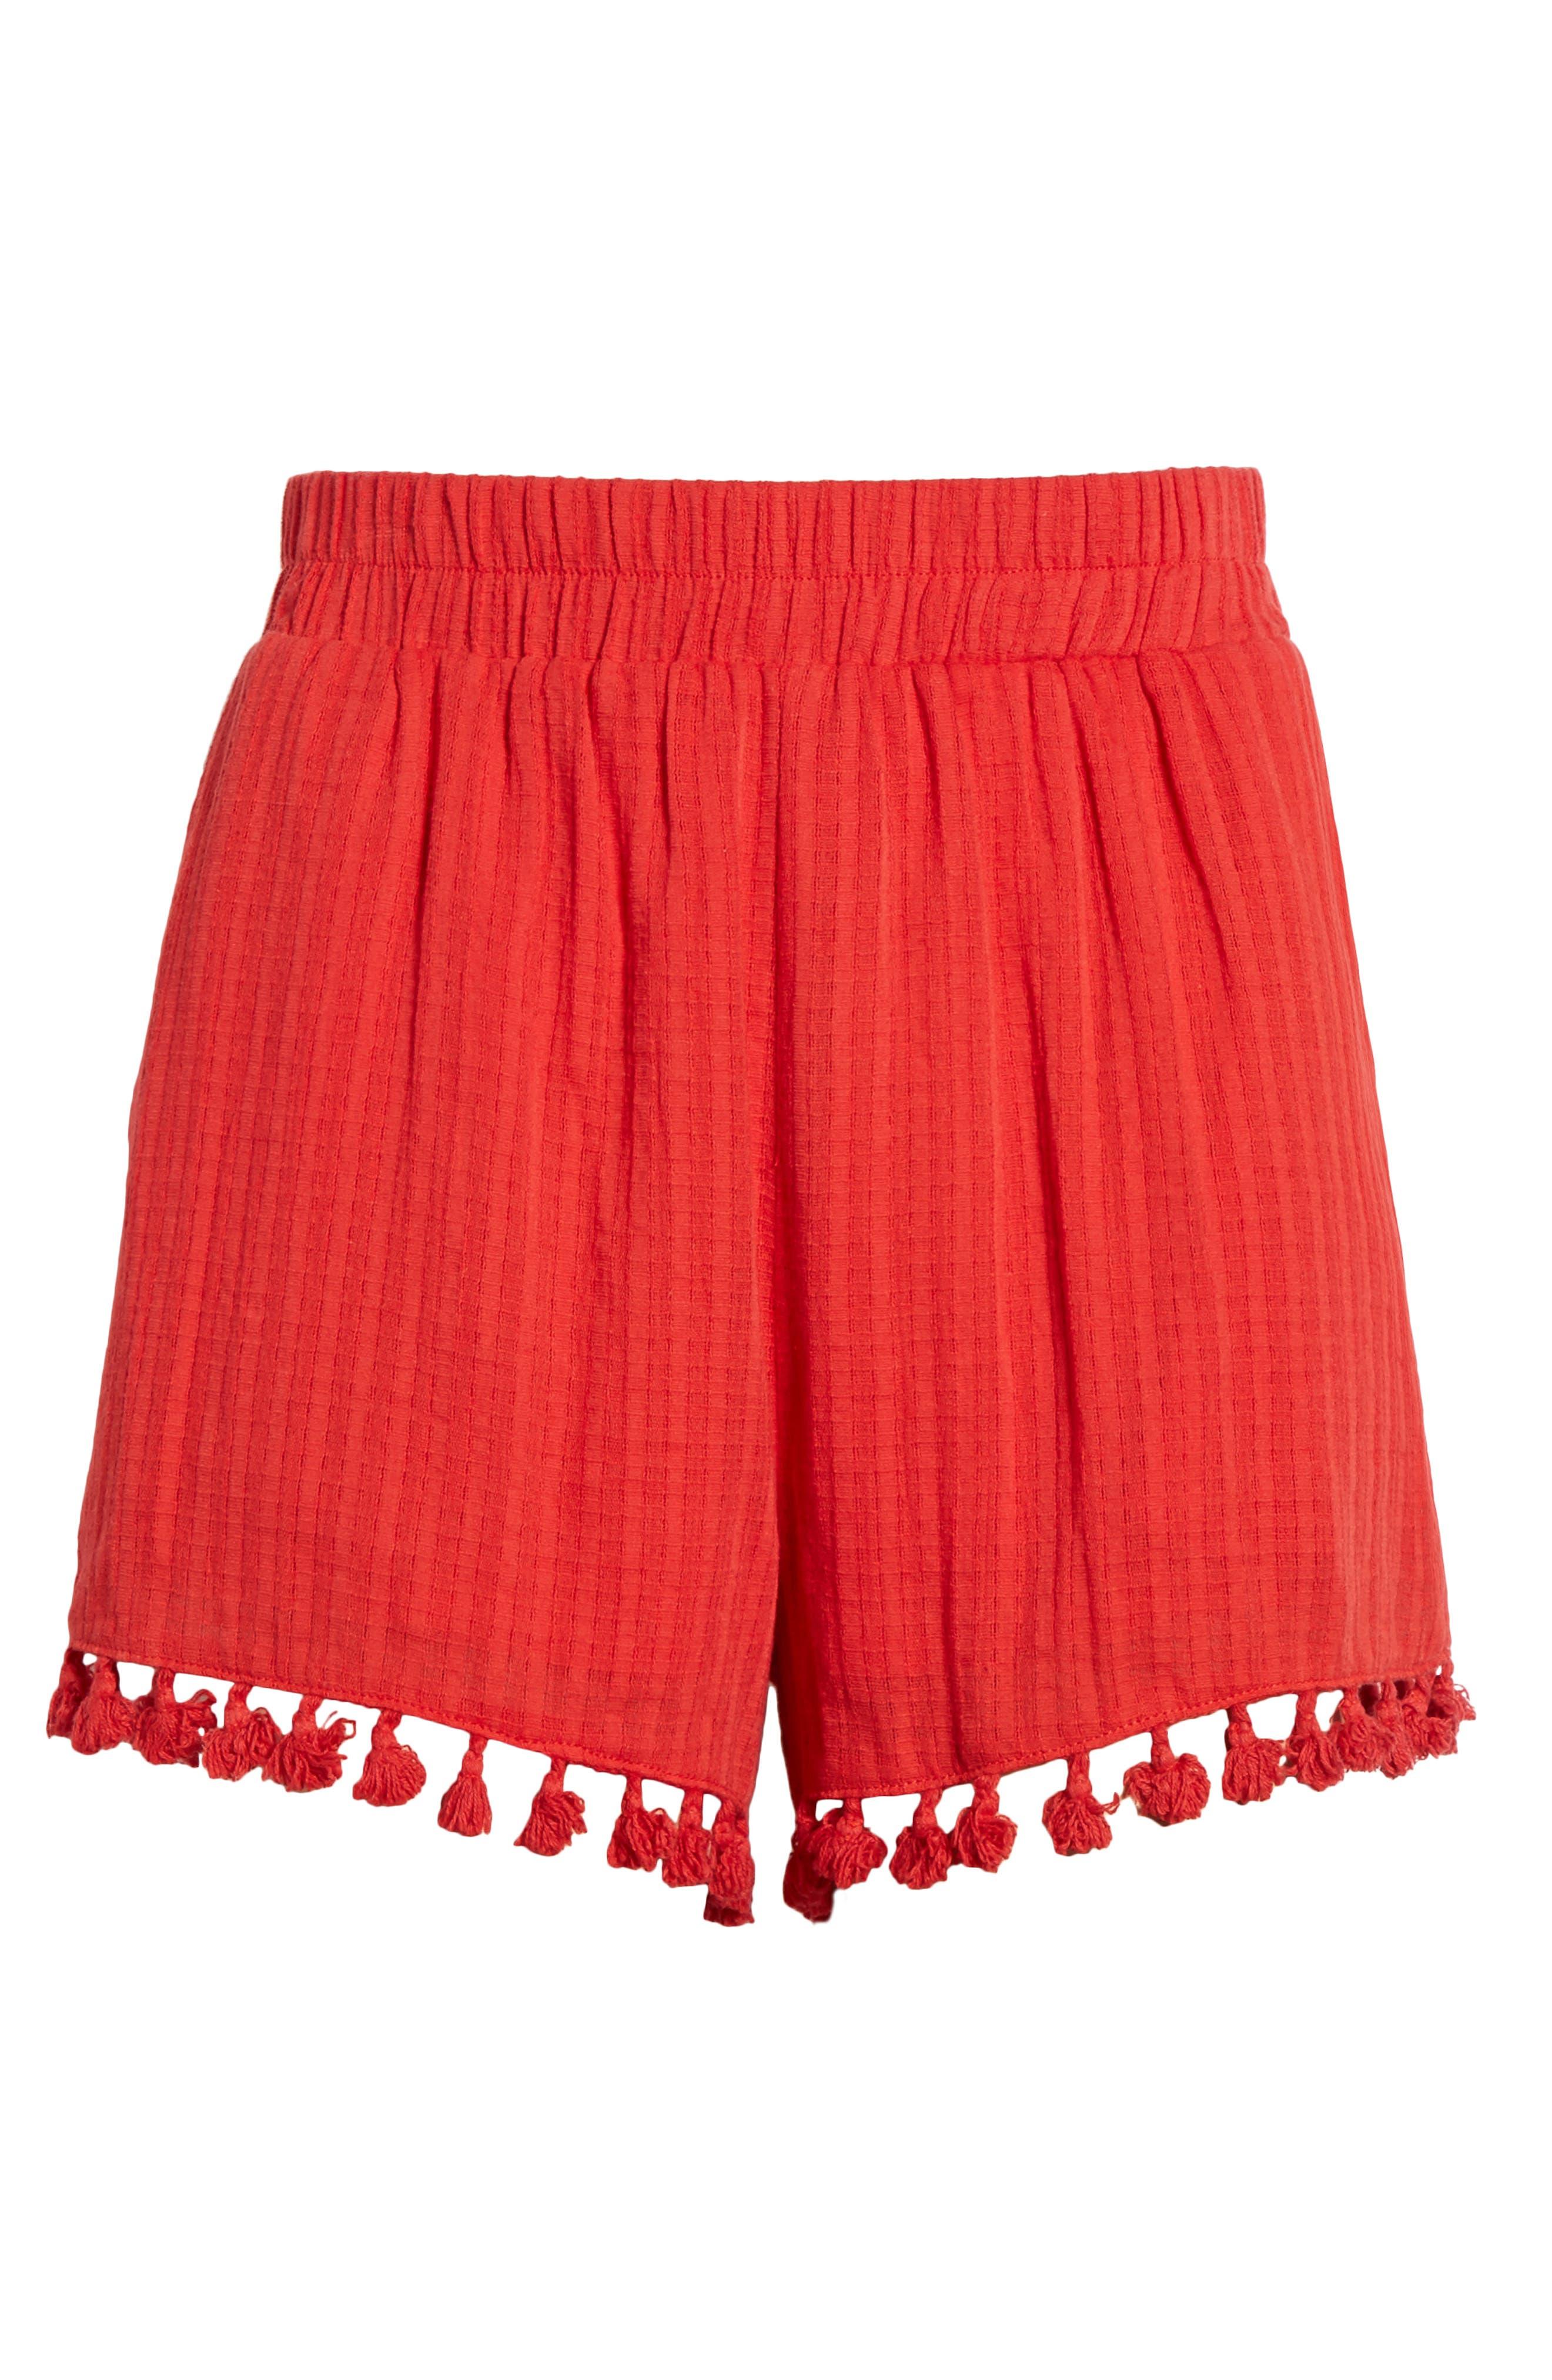 Pompom Trim Shorts,                             Alternate thumbnail 7, color,                             Red